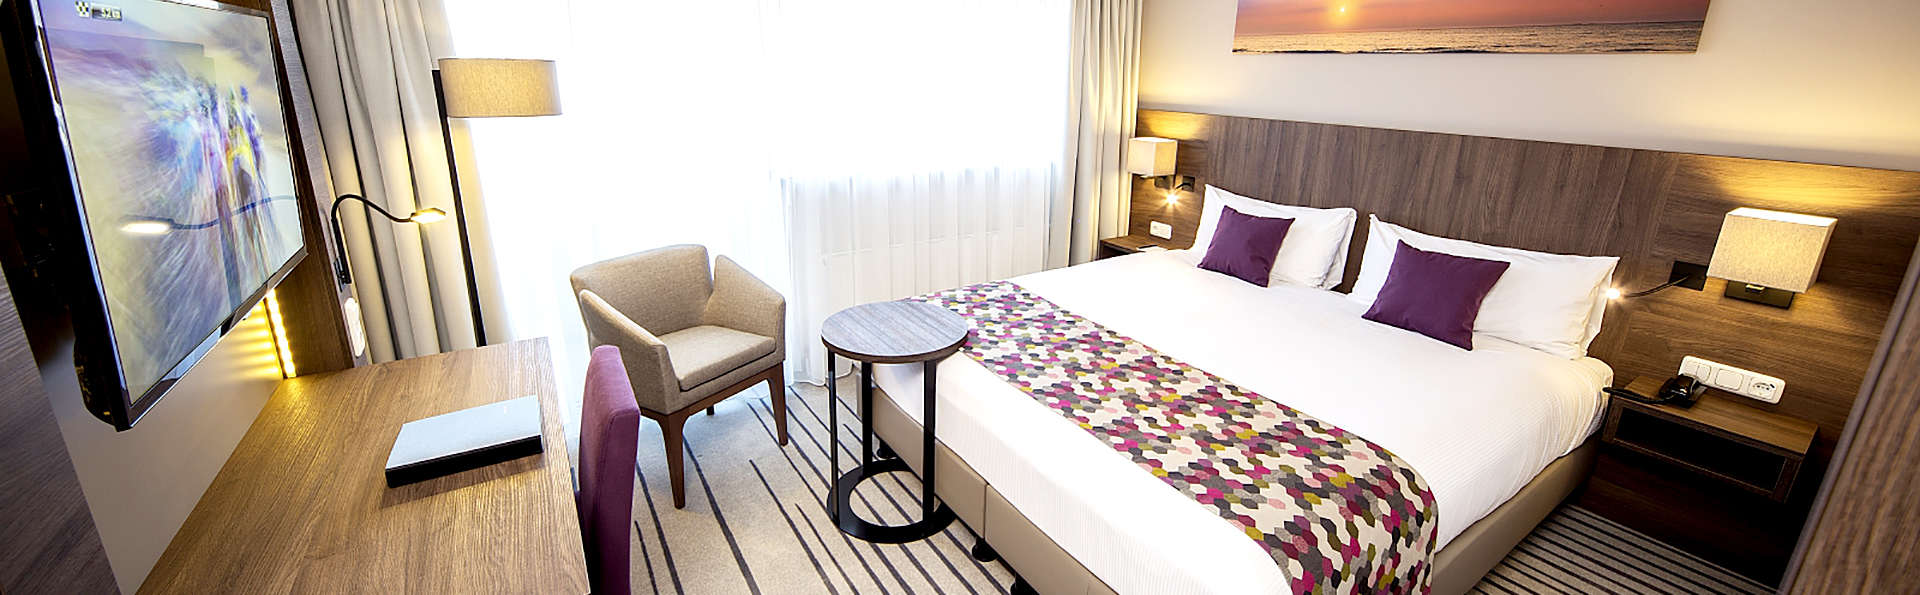 Descansa en una habitación Deluxe en Scheveningen